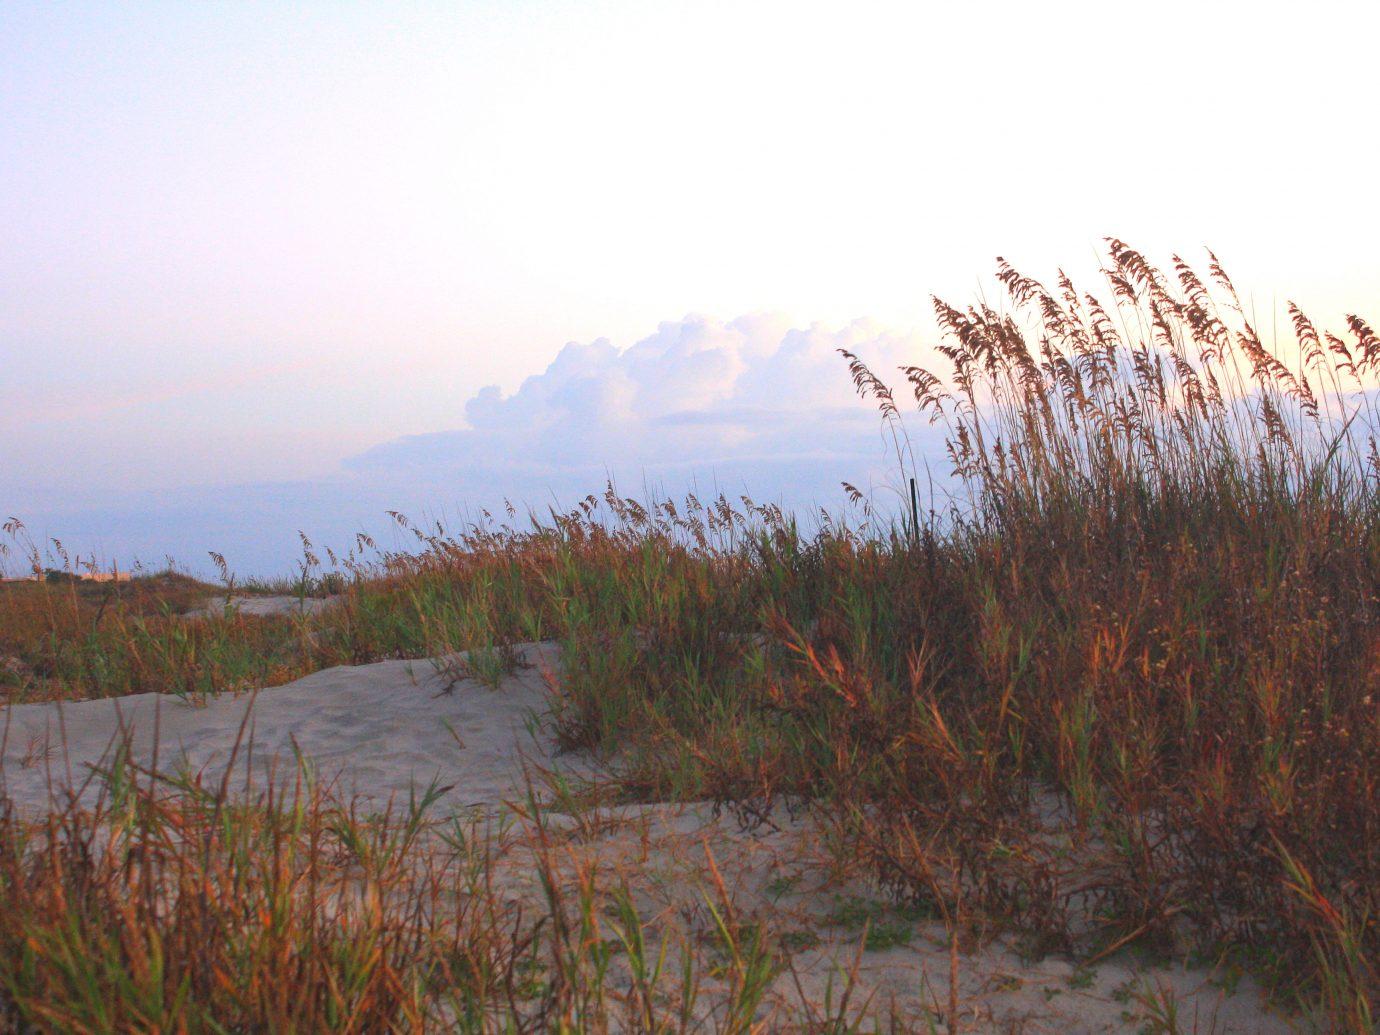 Sea oats wave against the sky on a sand dune on Jekyll Island, Georgia.